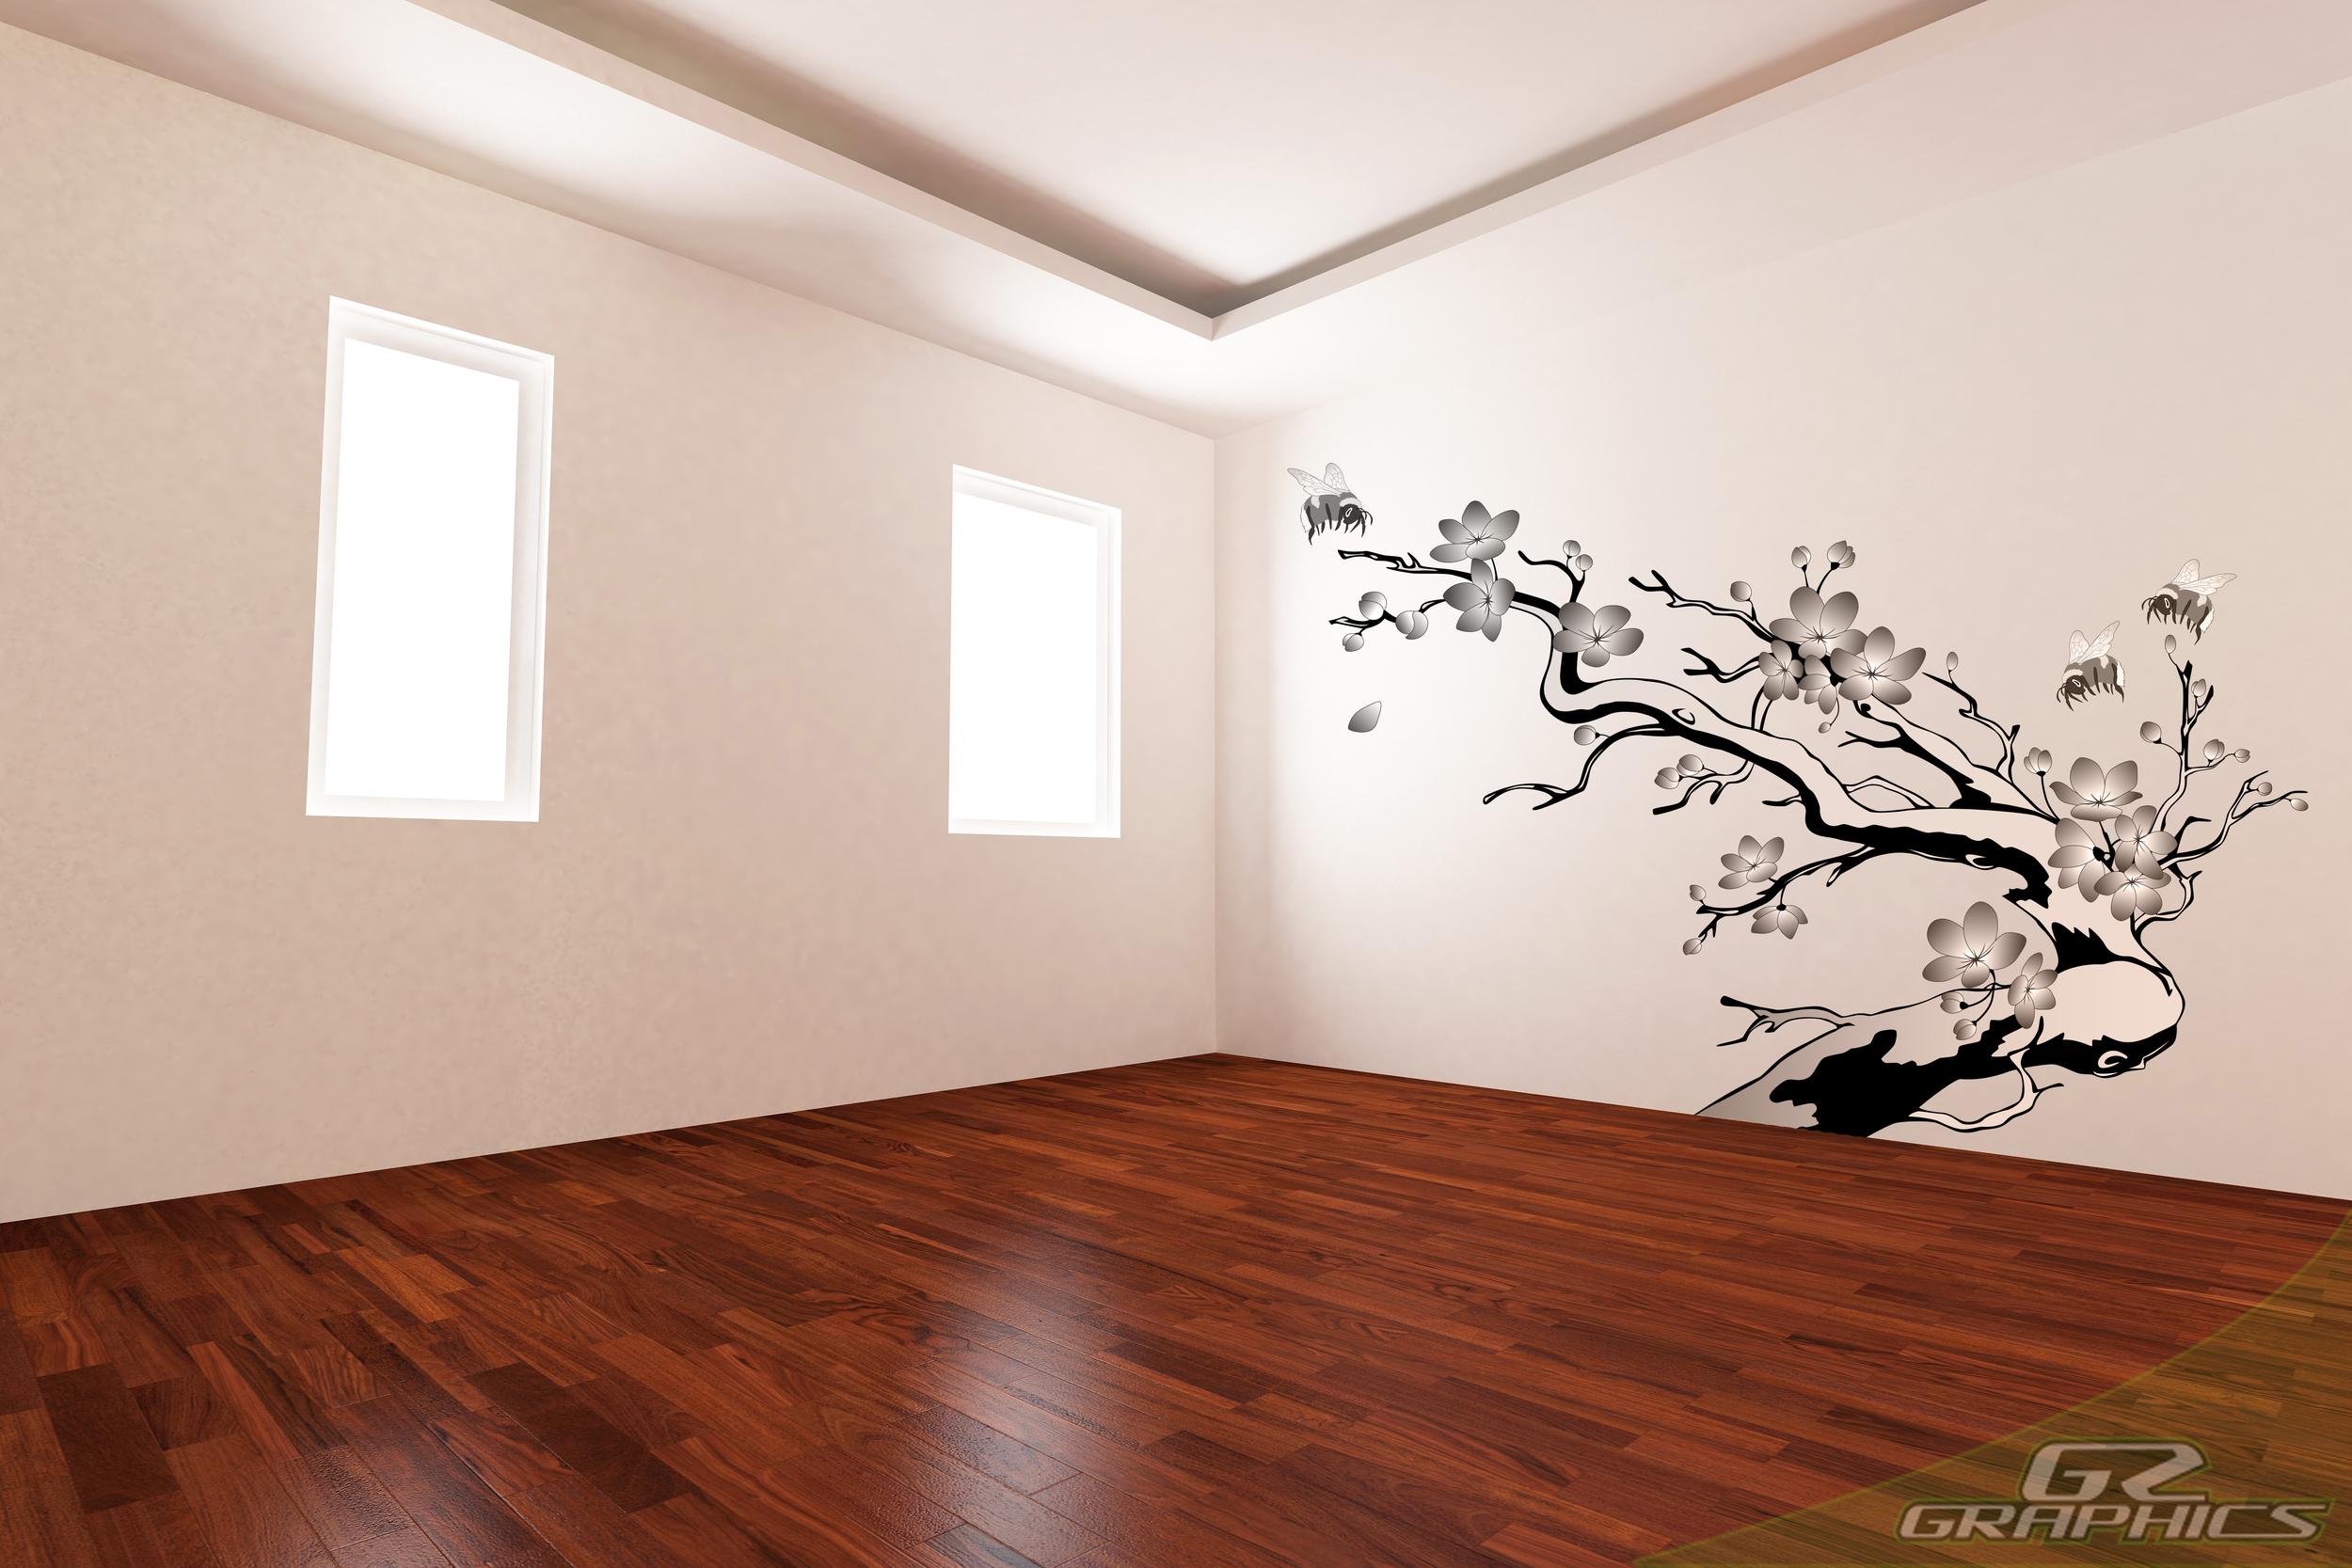 wall graphics idea 3.jpg